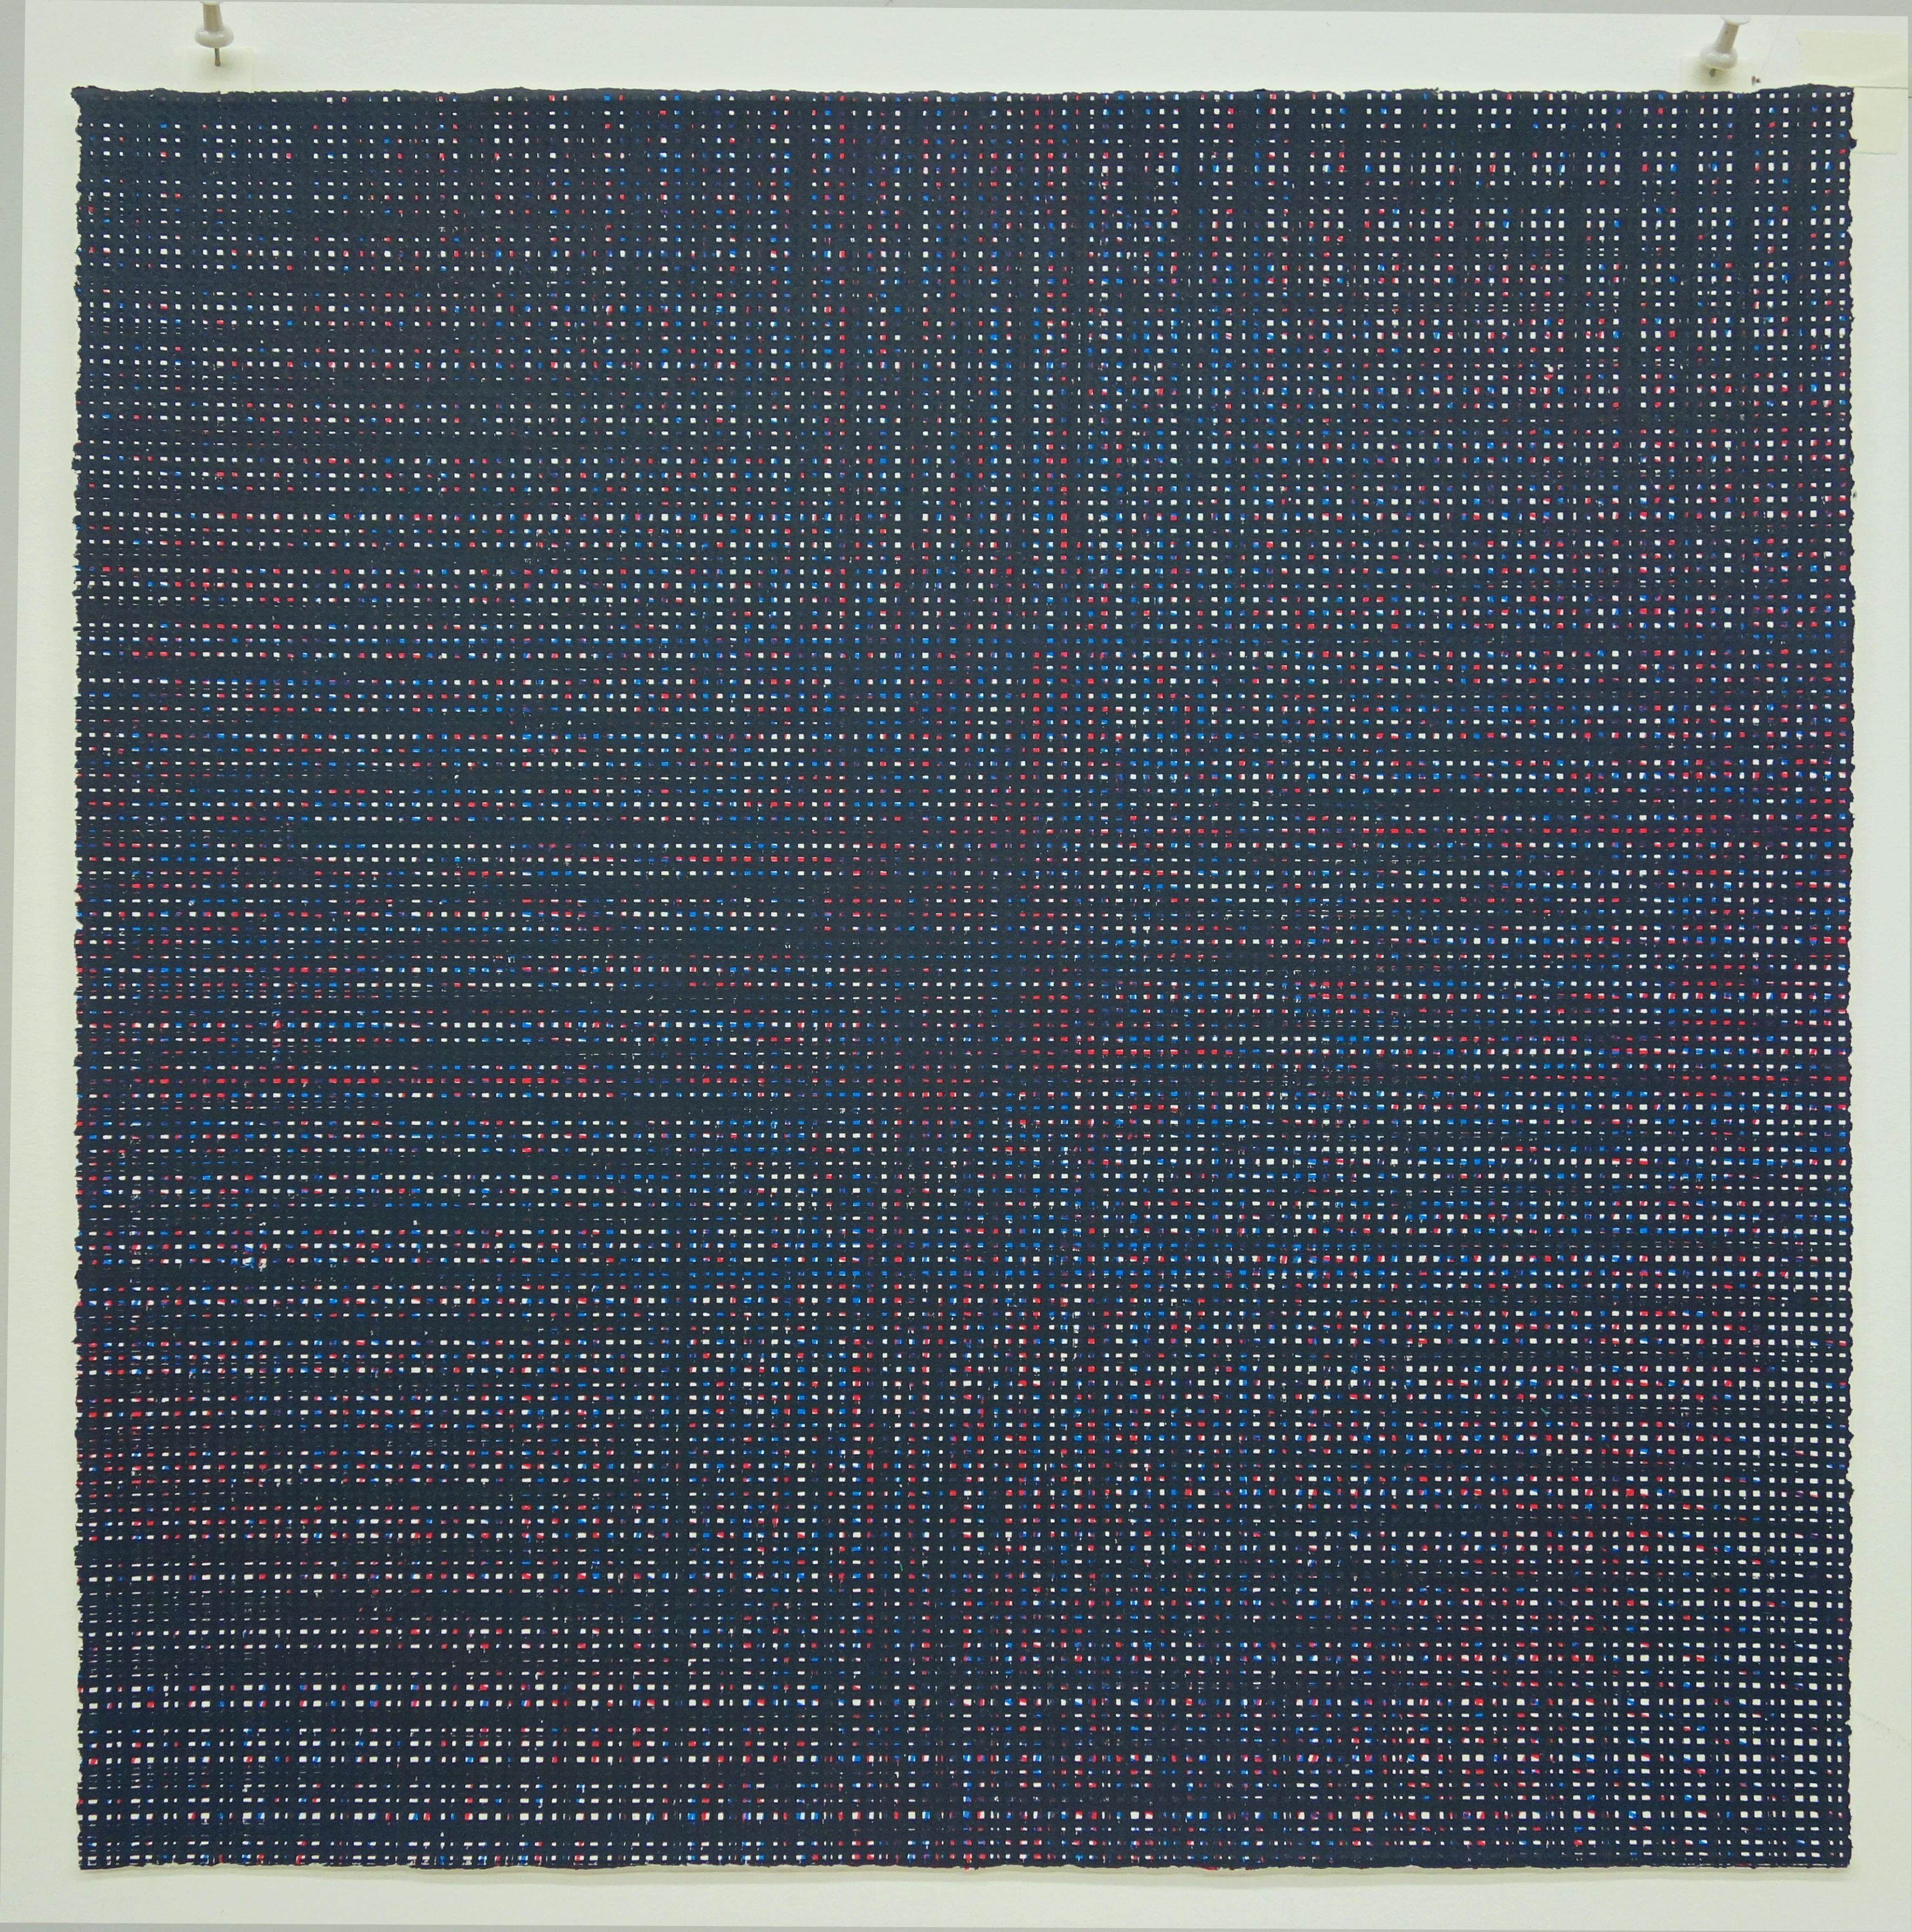 Rob de Oude, Untitled-Wassaic 7, 2016, silkscreen, 18 x 18 inches, Suite of 10